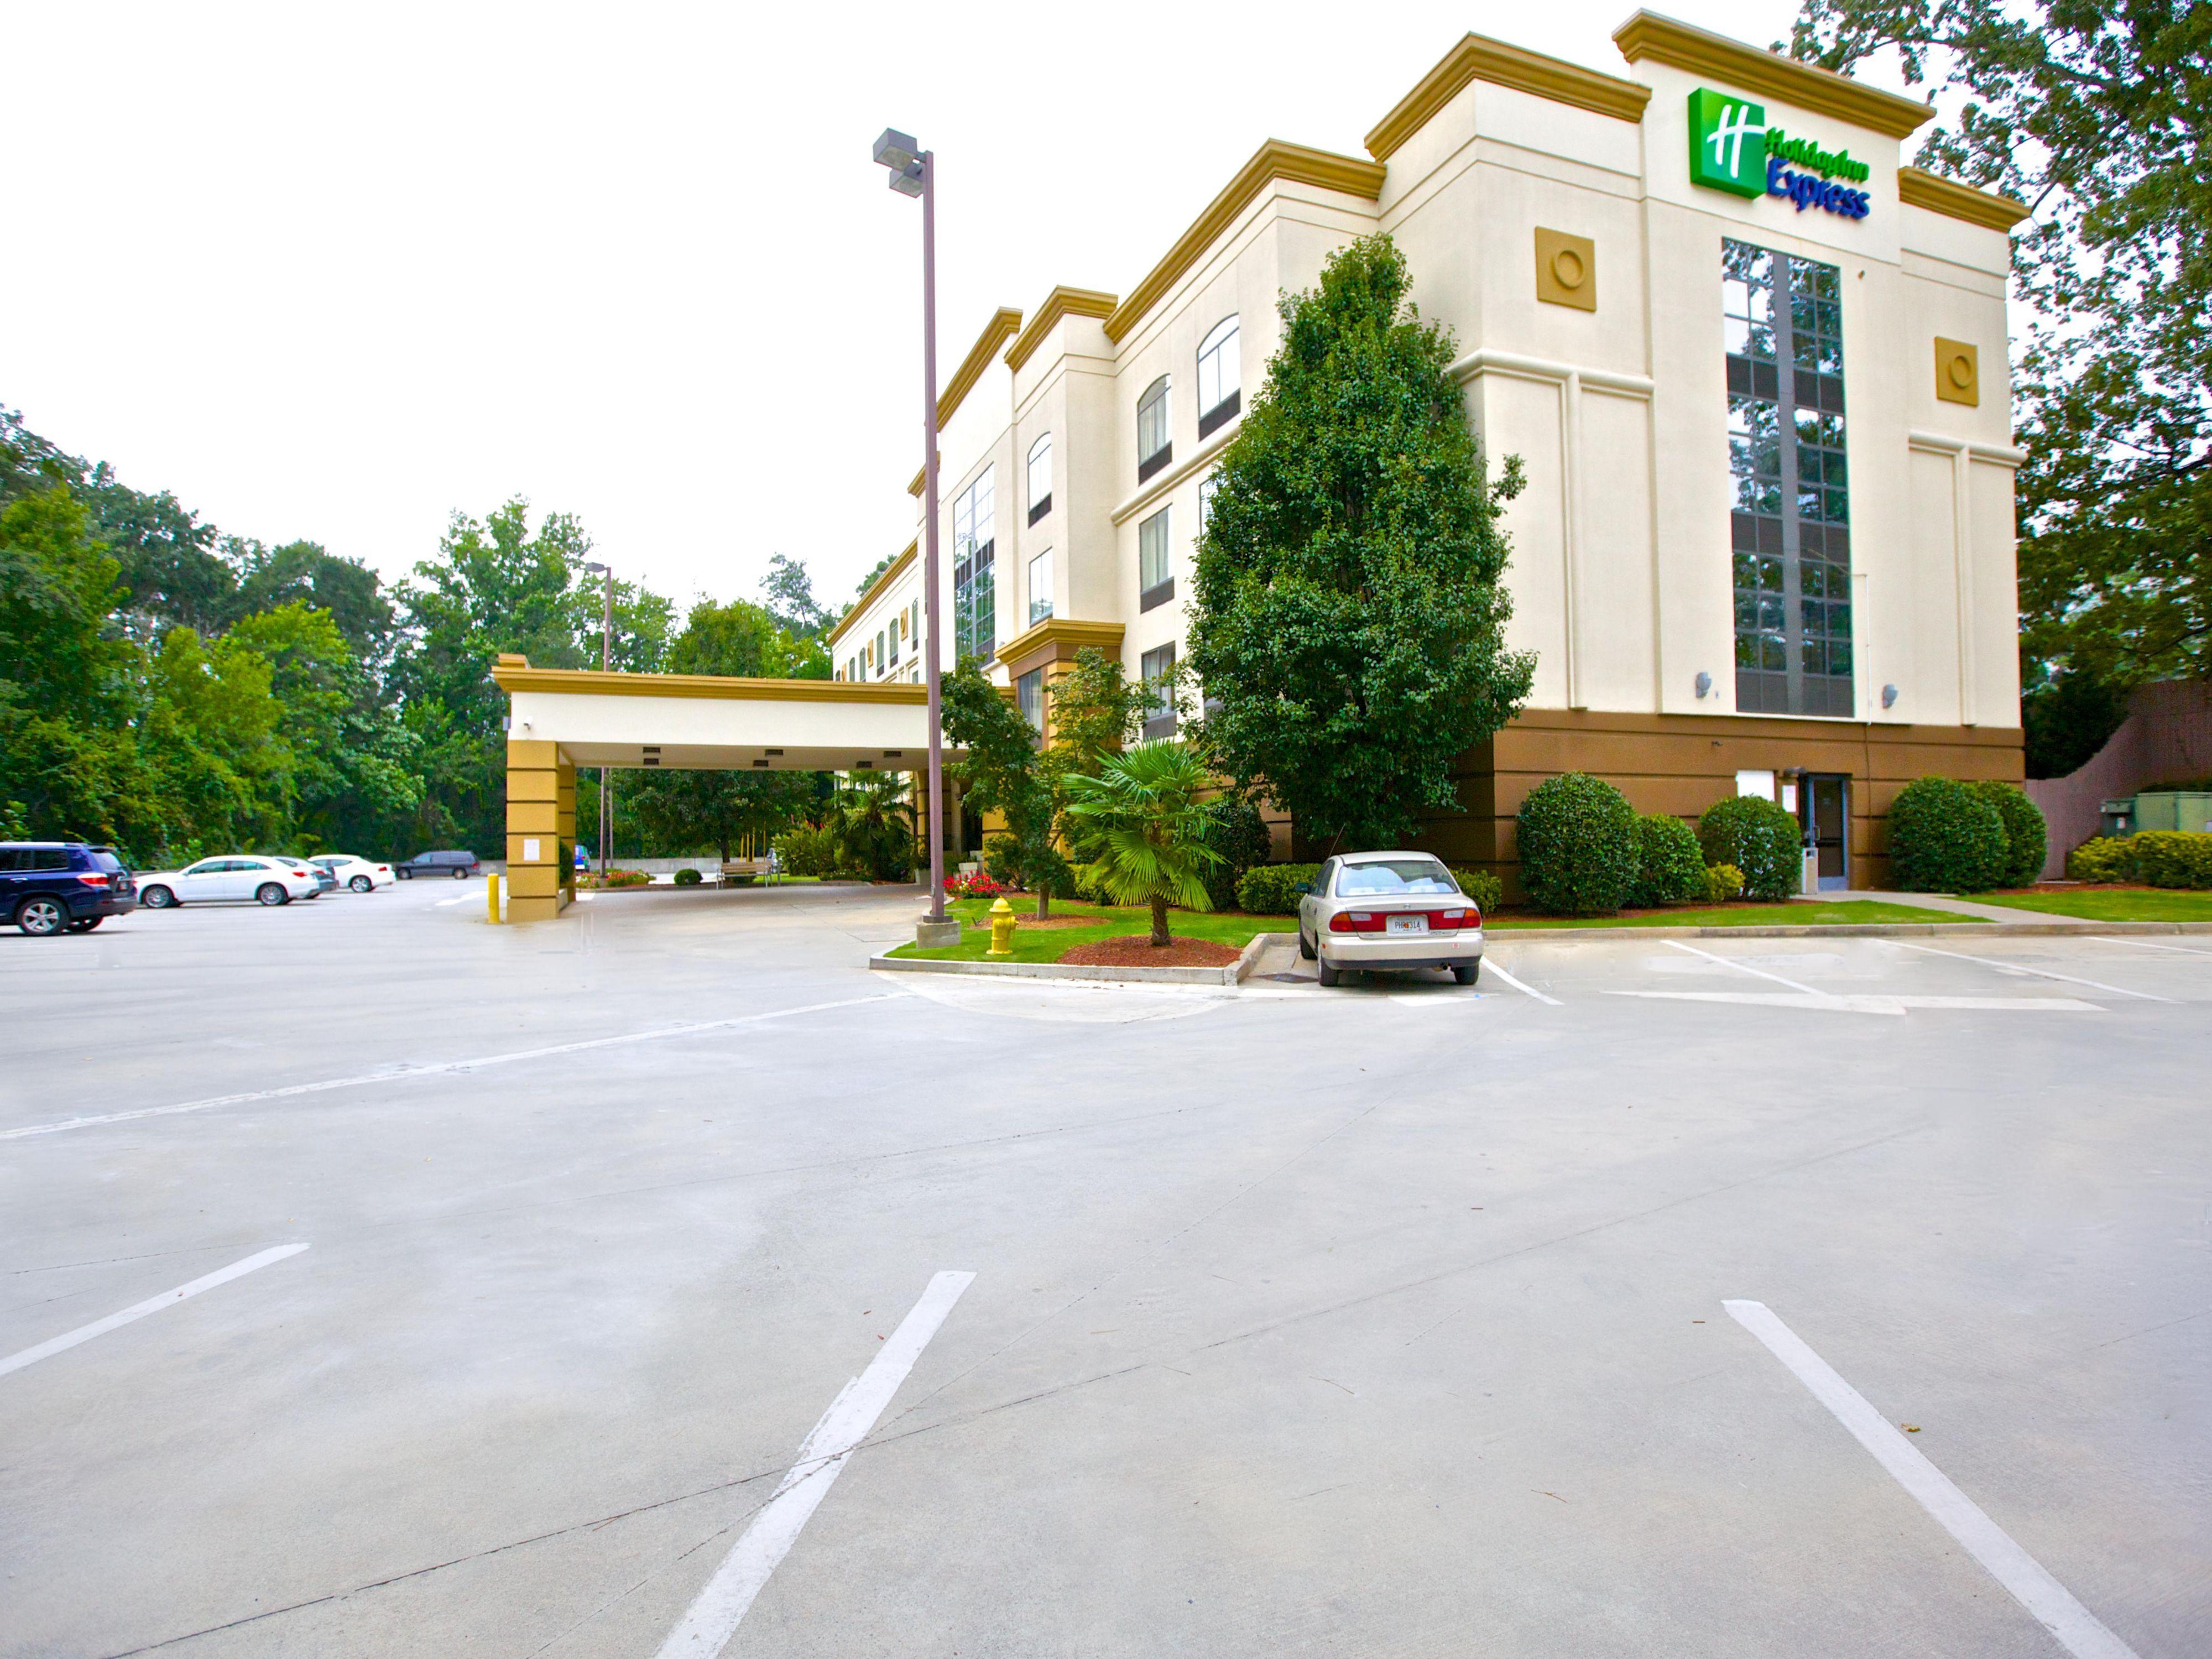 Hotels Near Oglethorpe University in Atlanta, Georgia